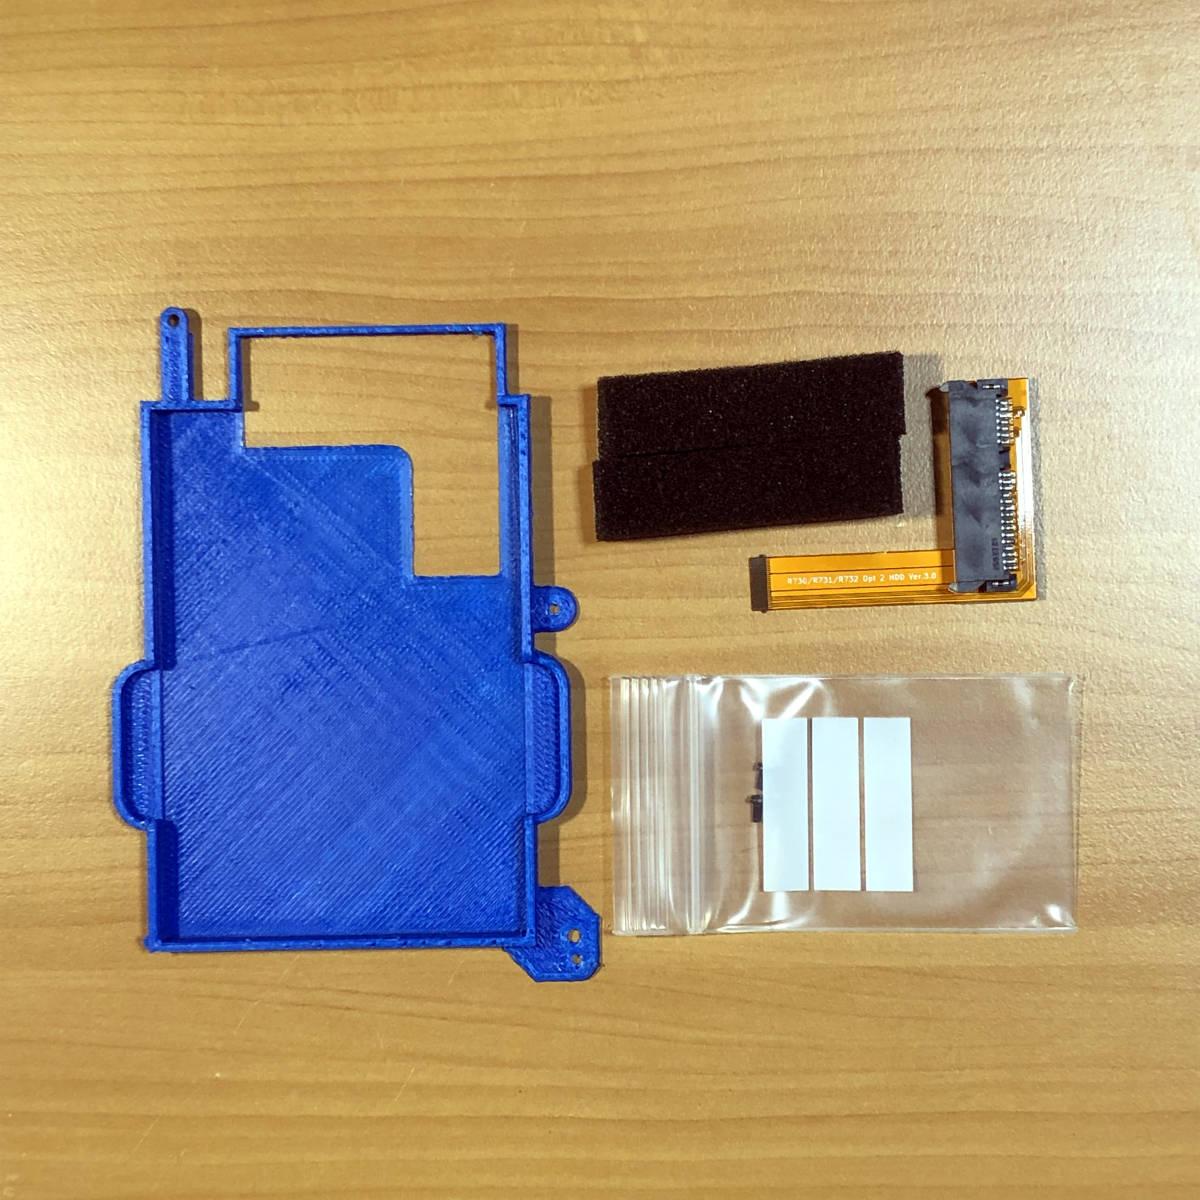 dynabook R730/R731/R732 光学ドライブ非搭載モデル用HDD/SSD増設キット_画像4